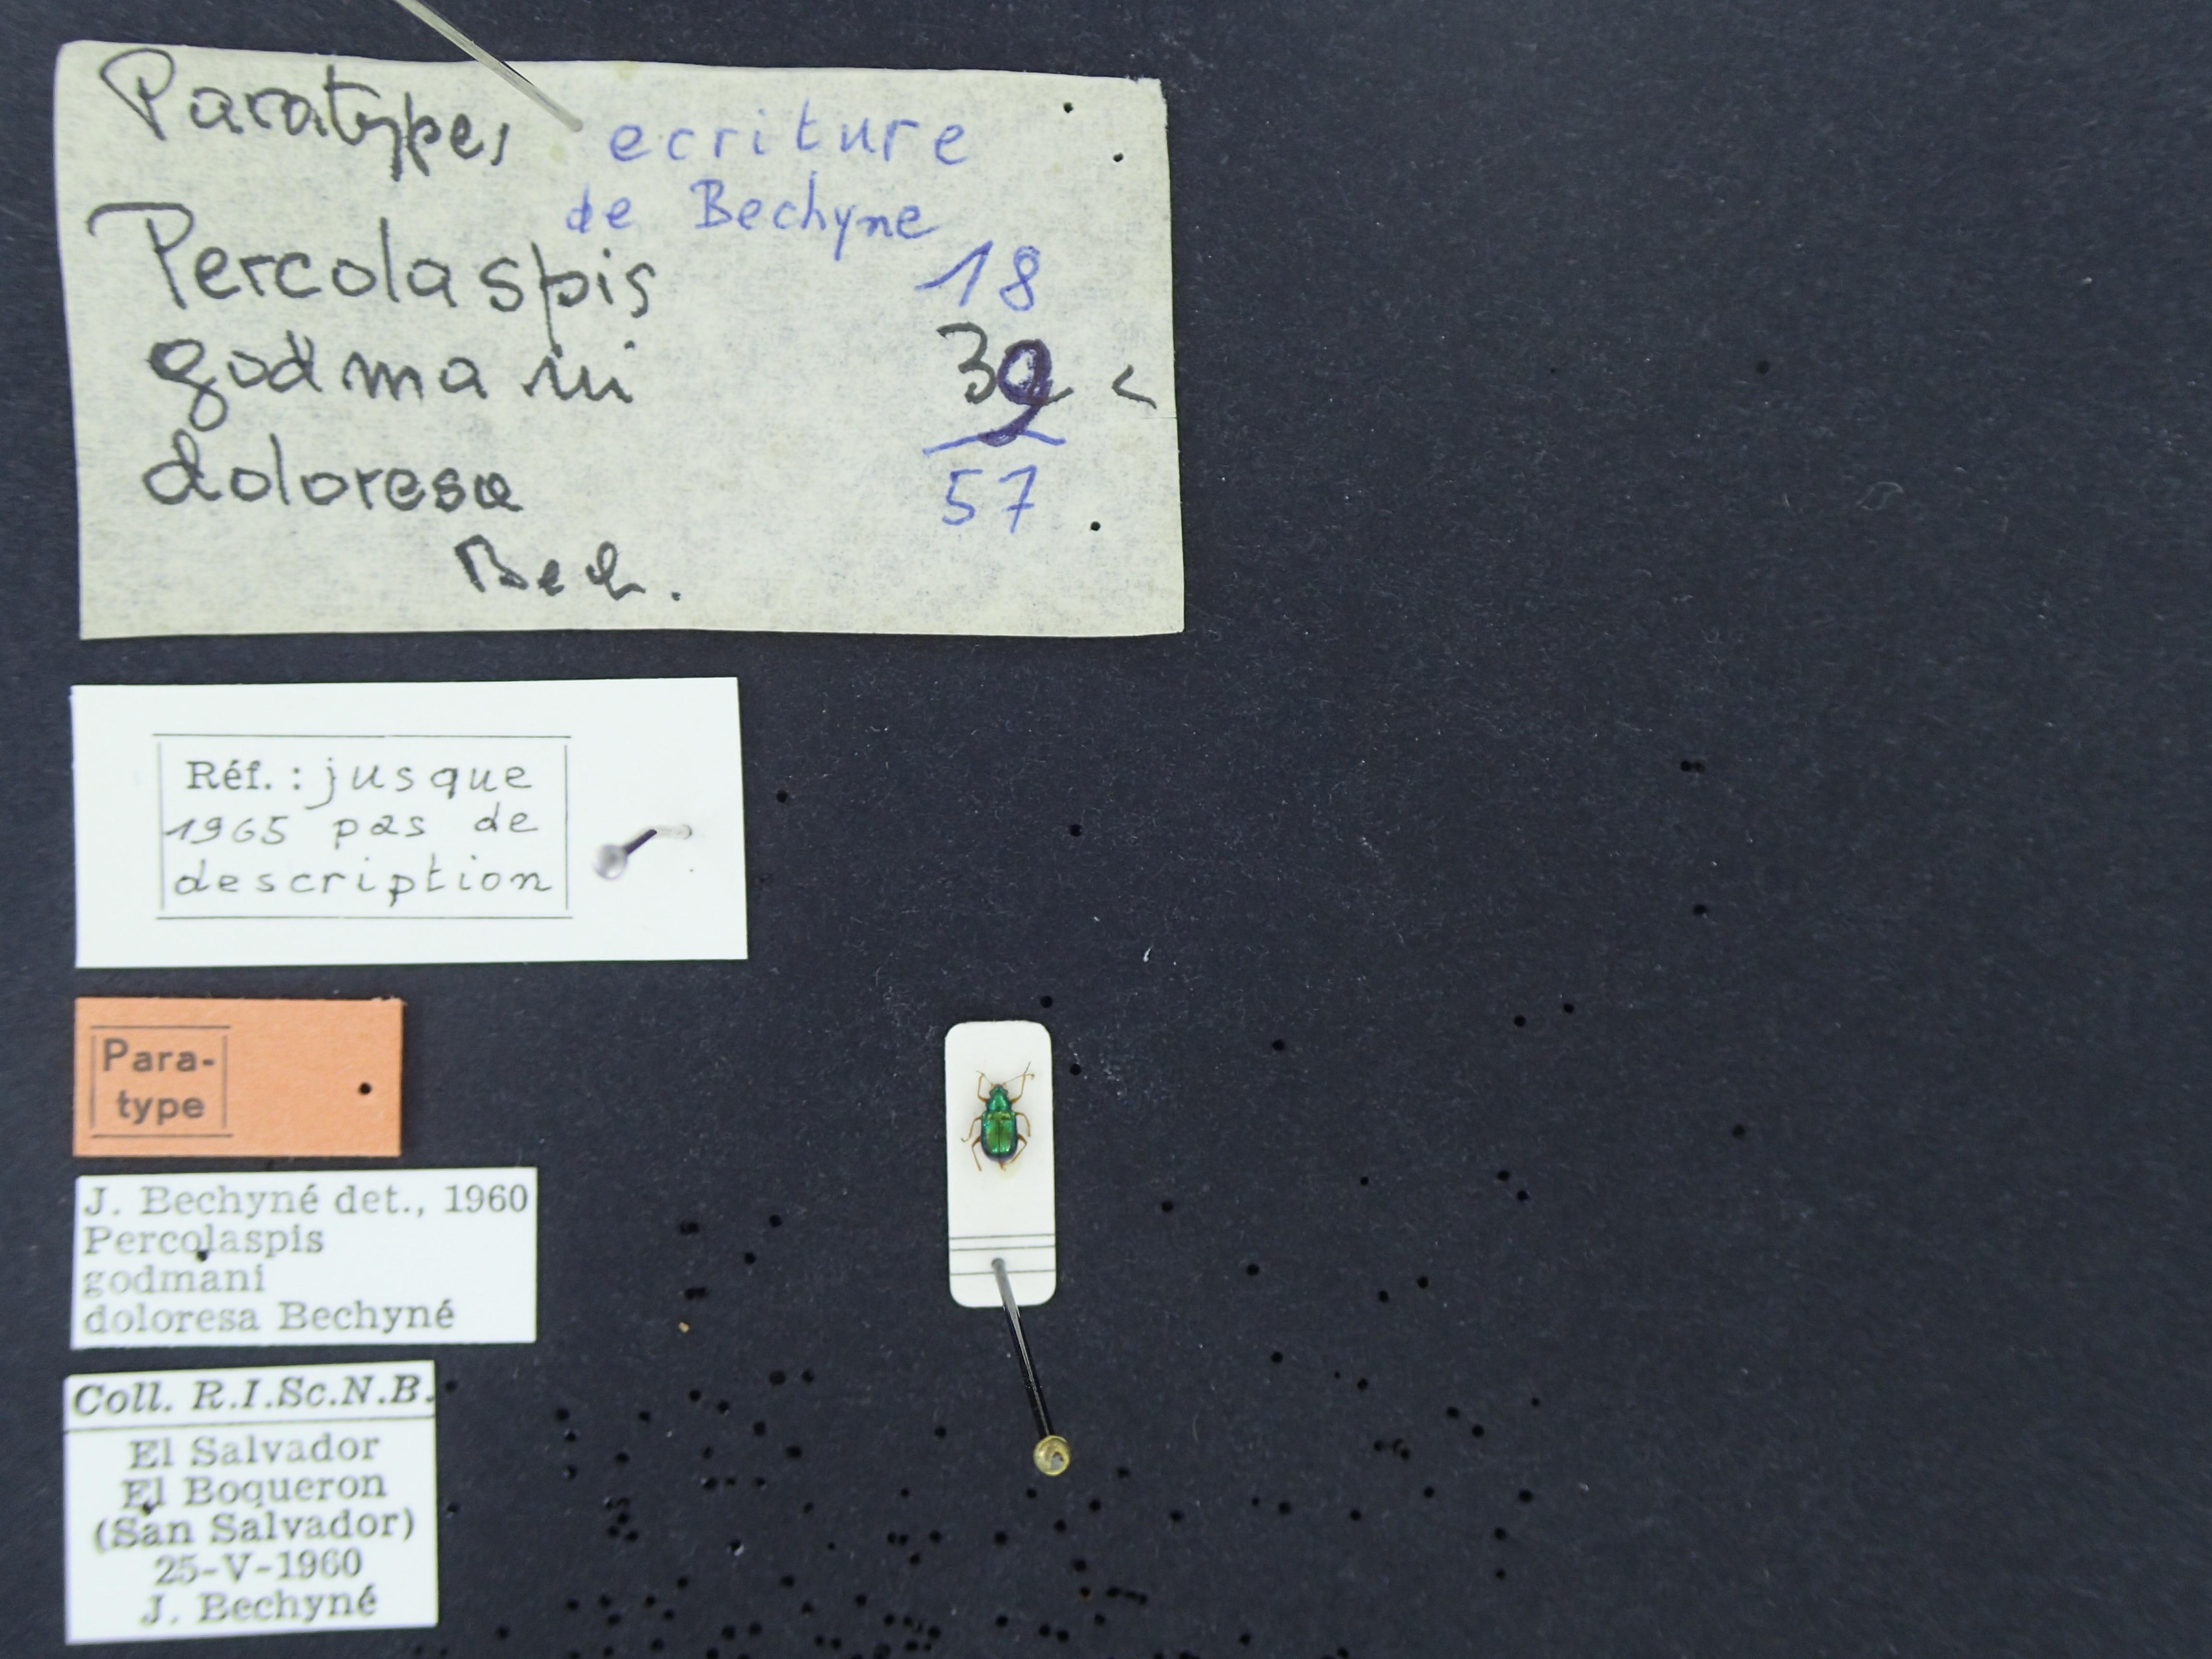 BE-RBINS-ENT Percolaspis godmani doloresa K30_D04_042 Label.JPG